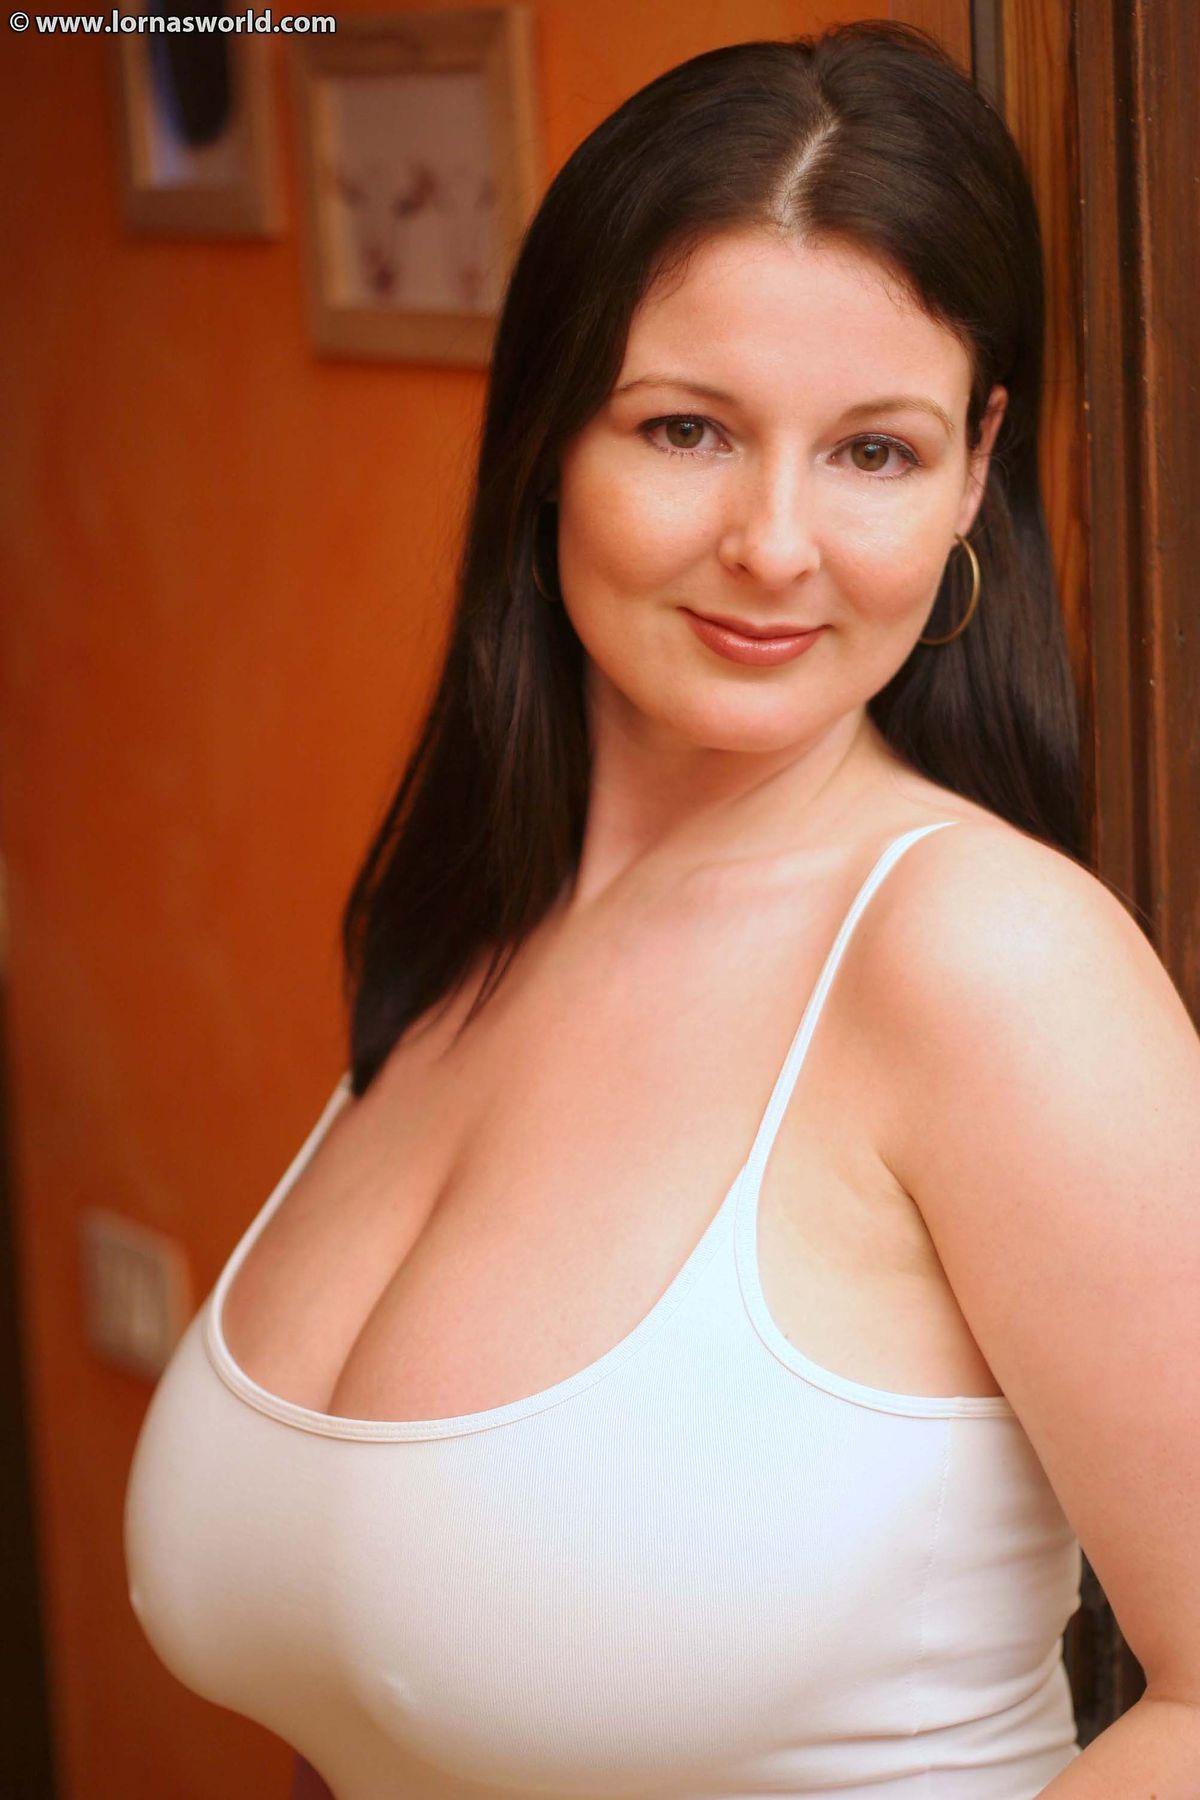 Eve angel white thong tank top